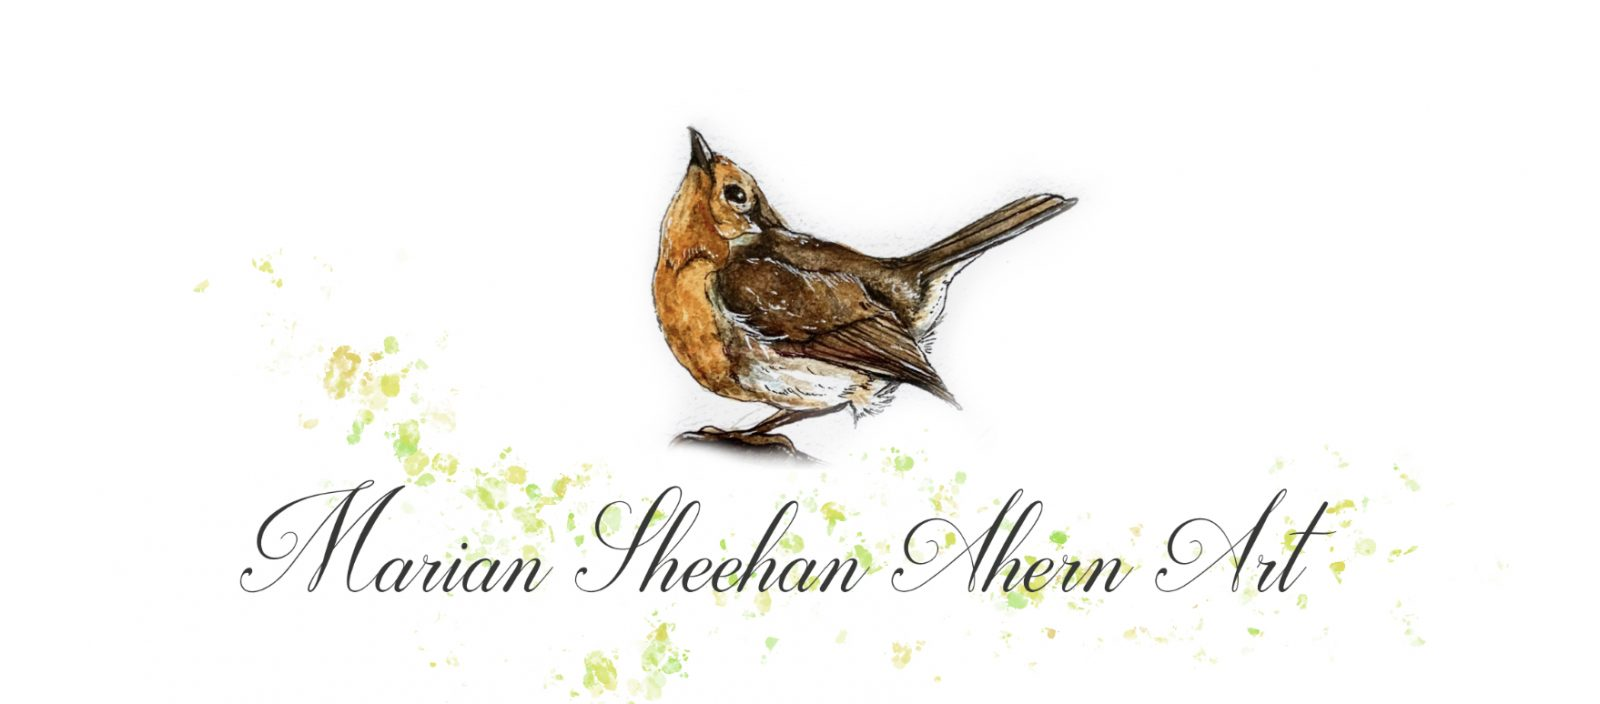 Marian Sheehan Ahern Art